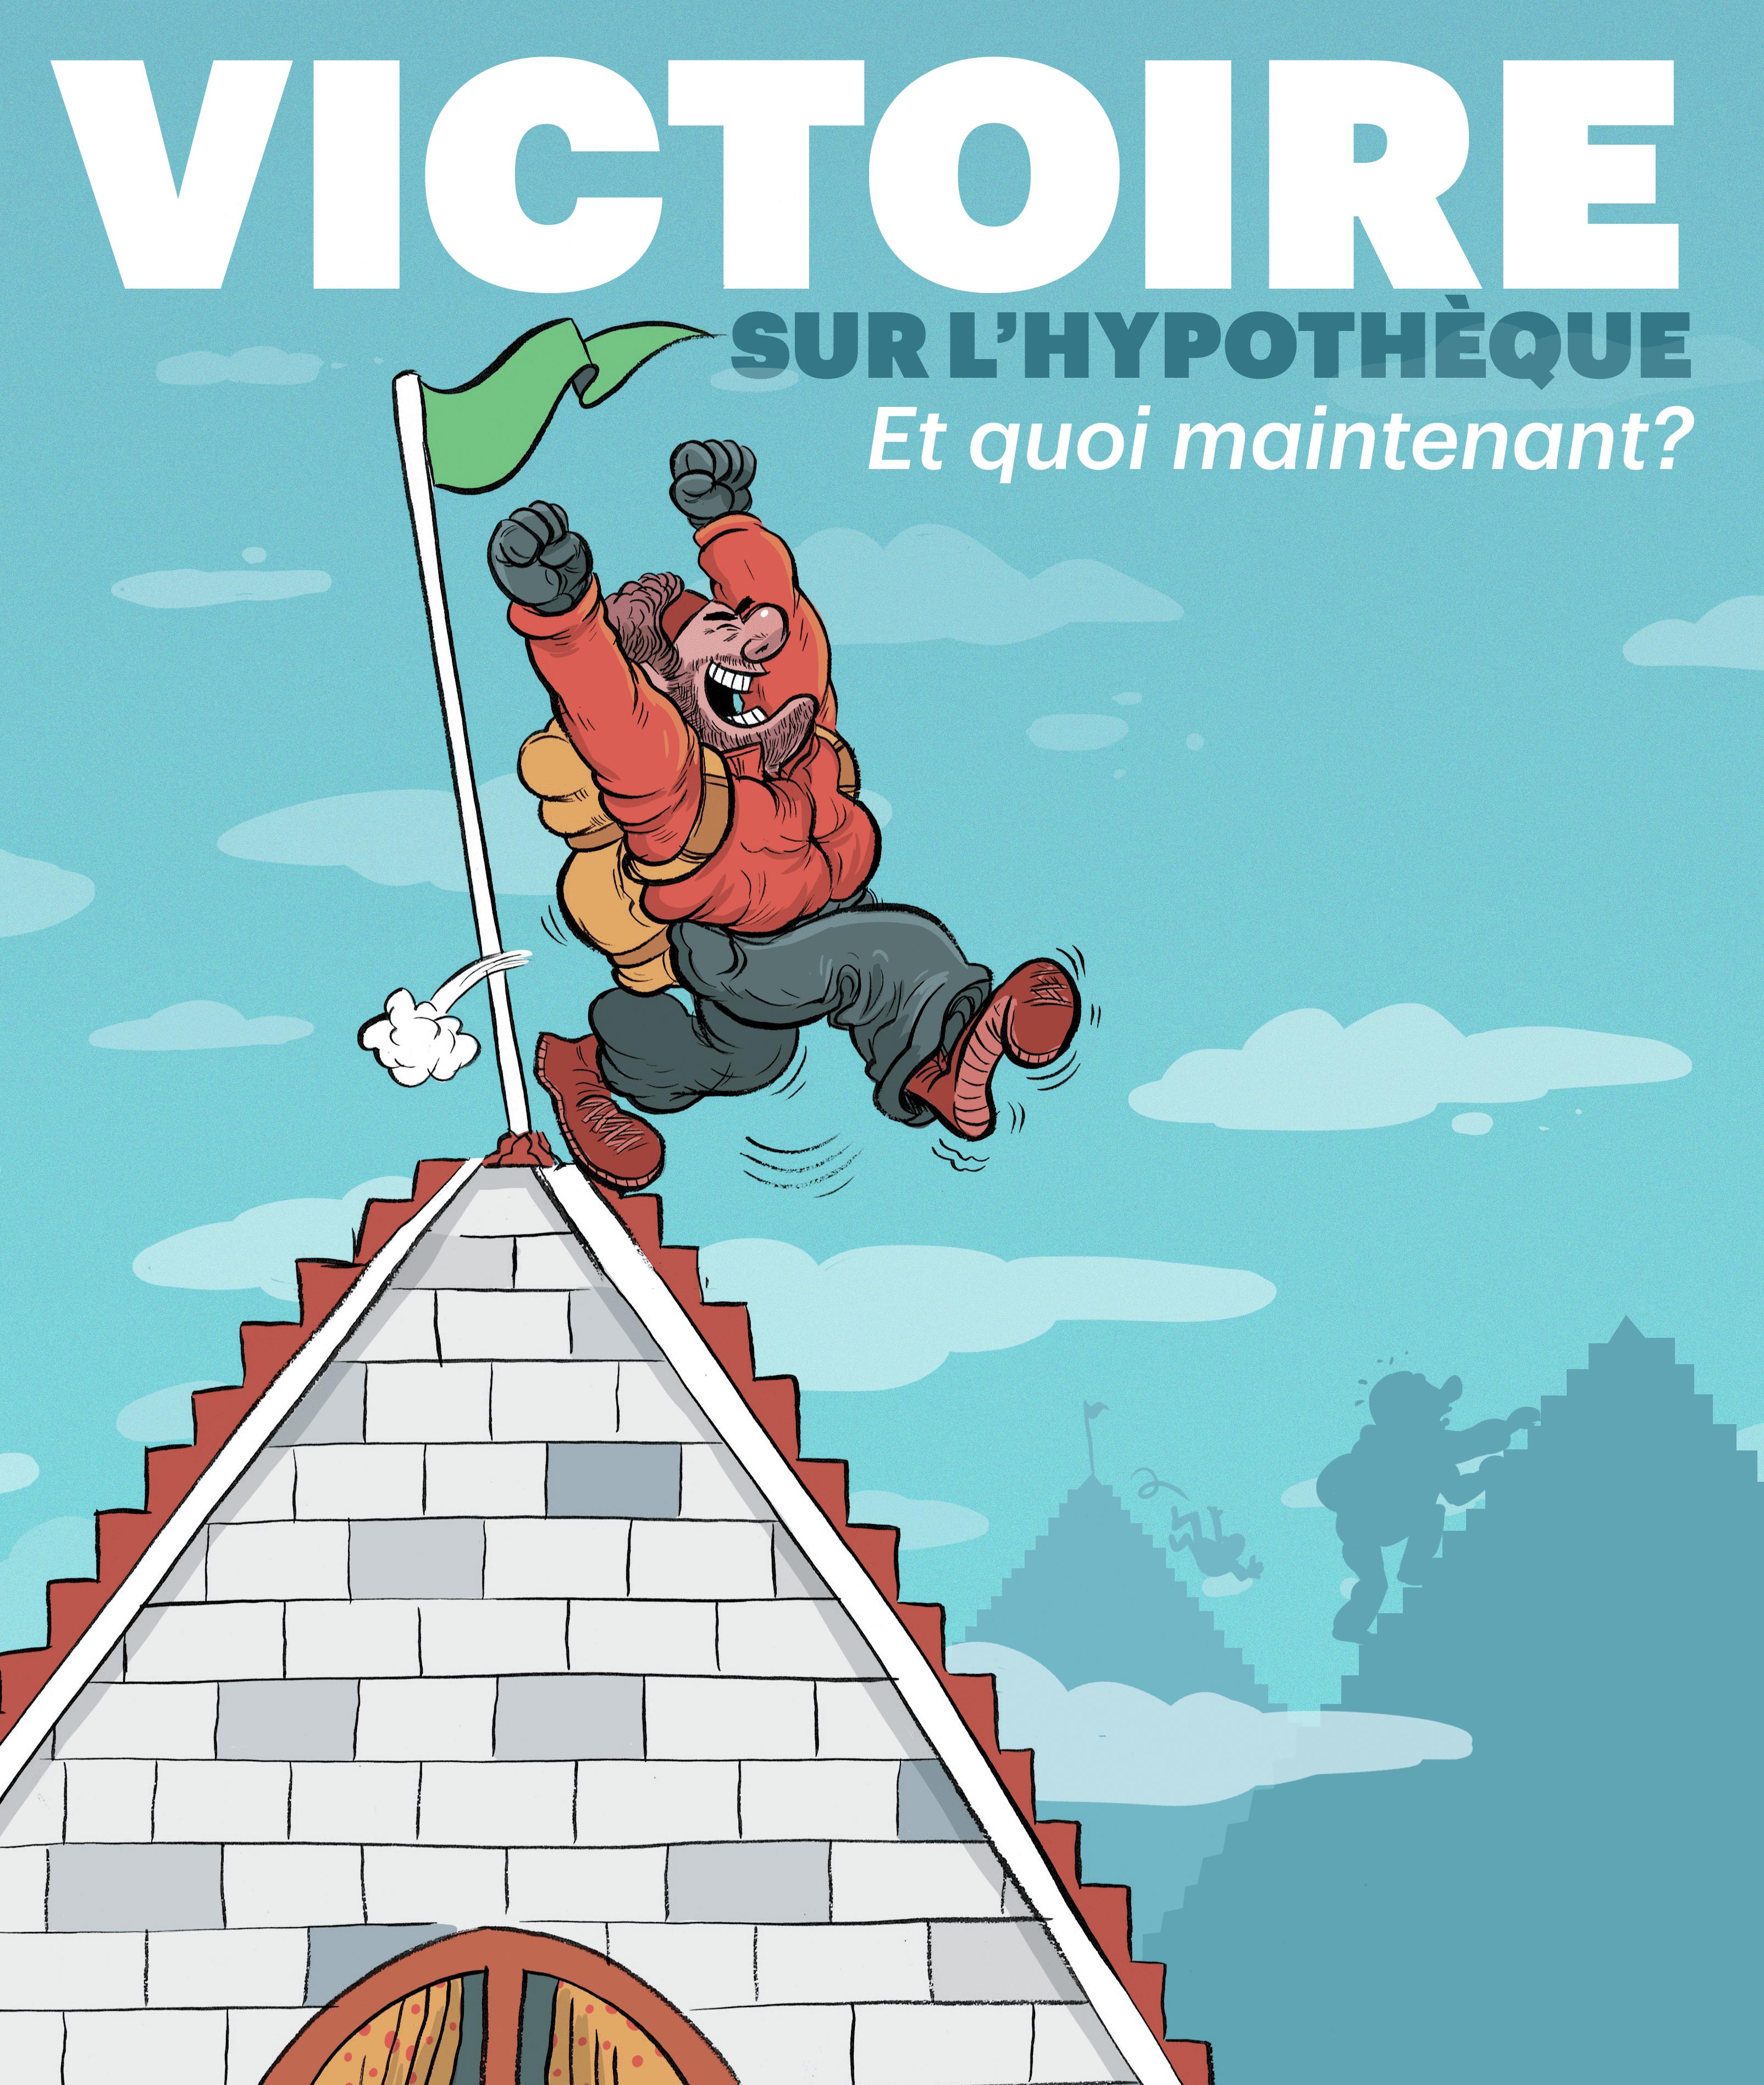 Illustration of man climbing house